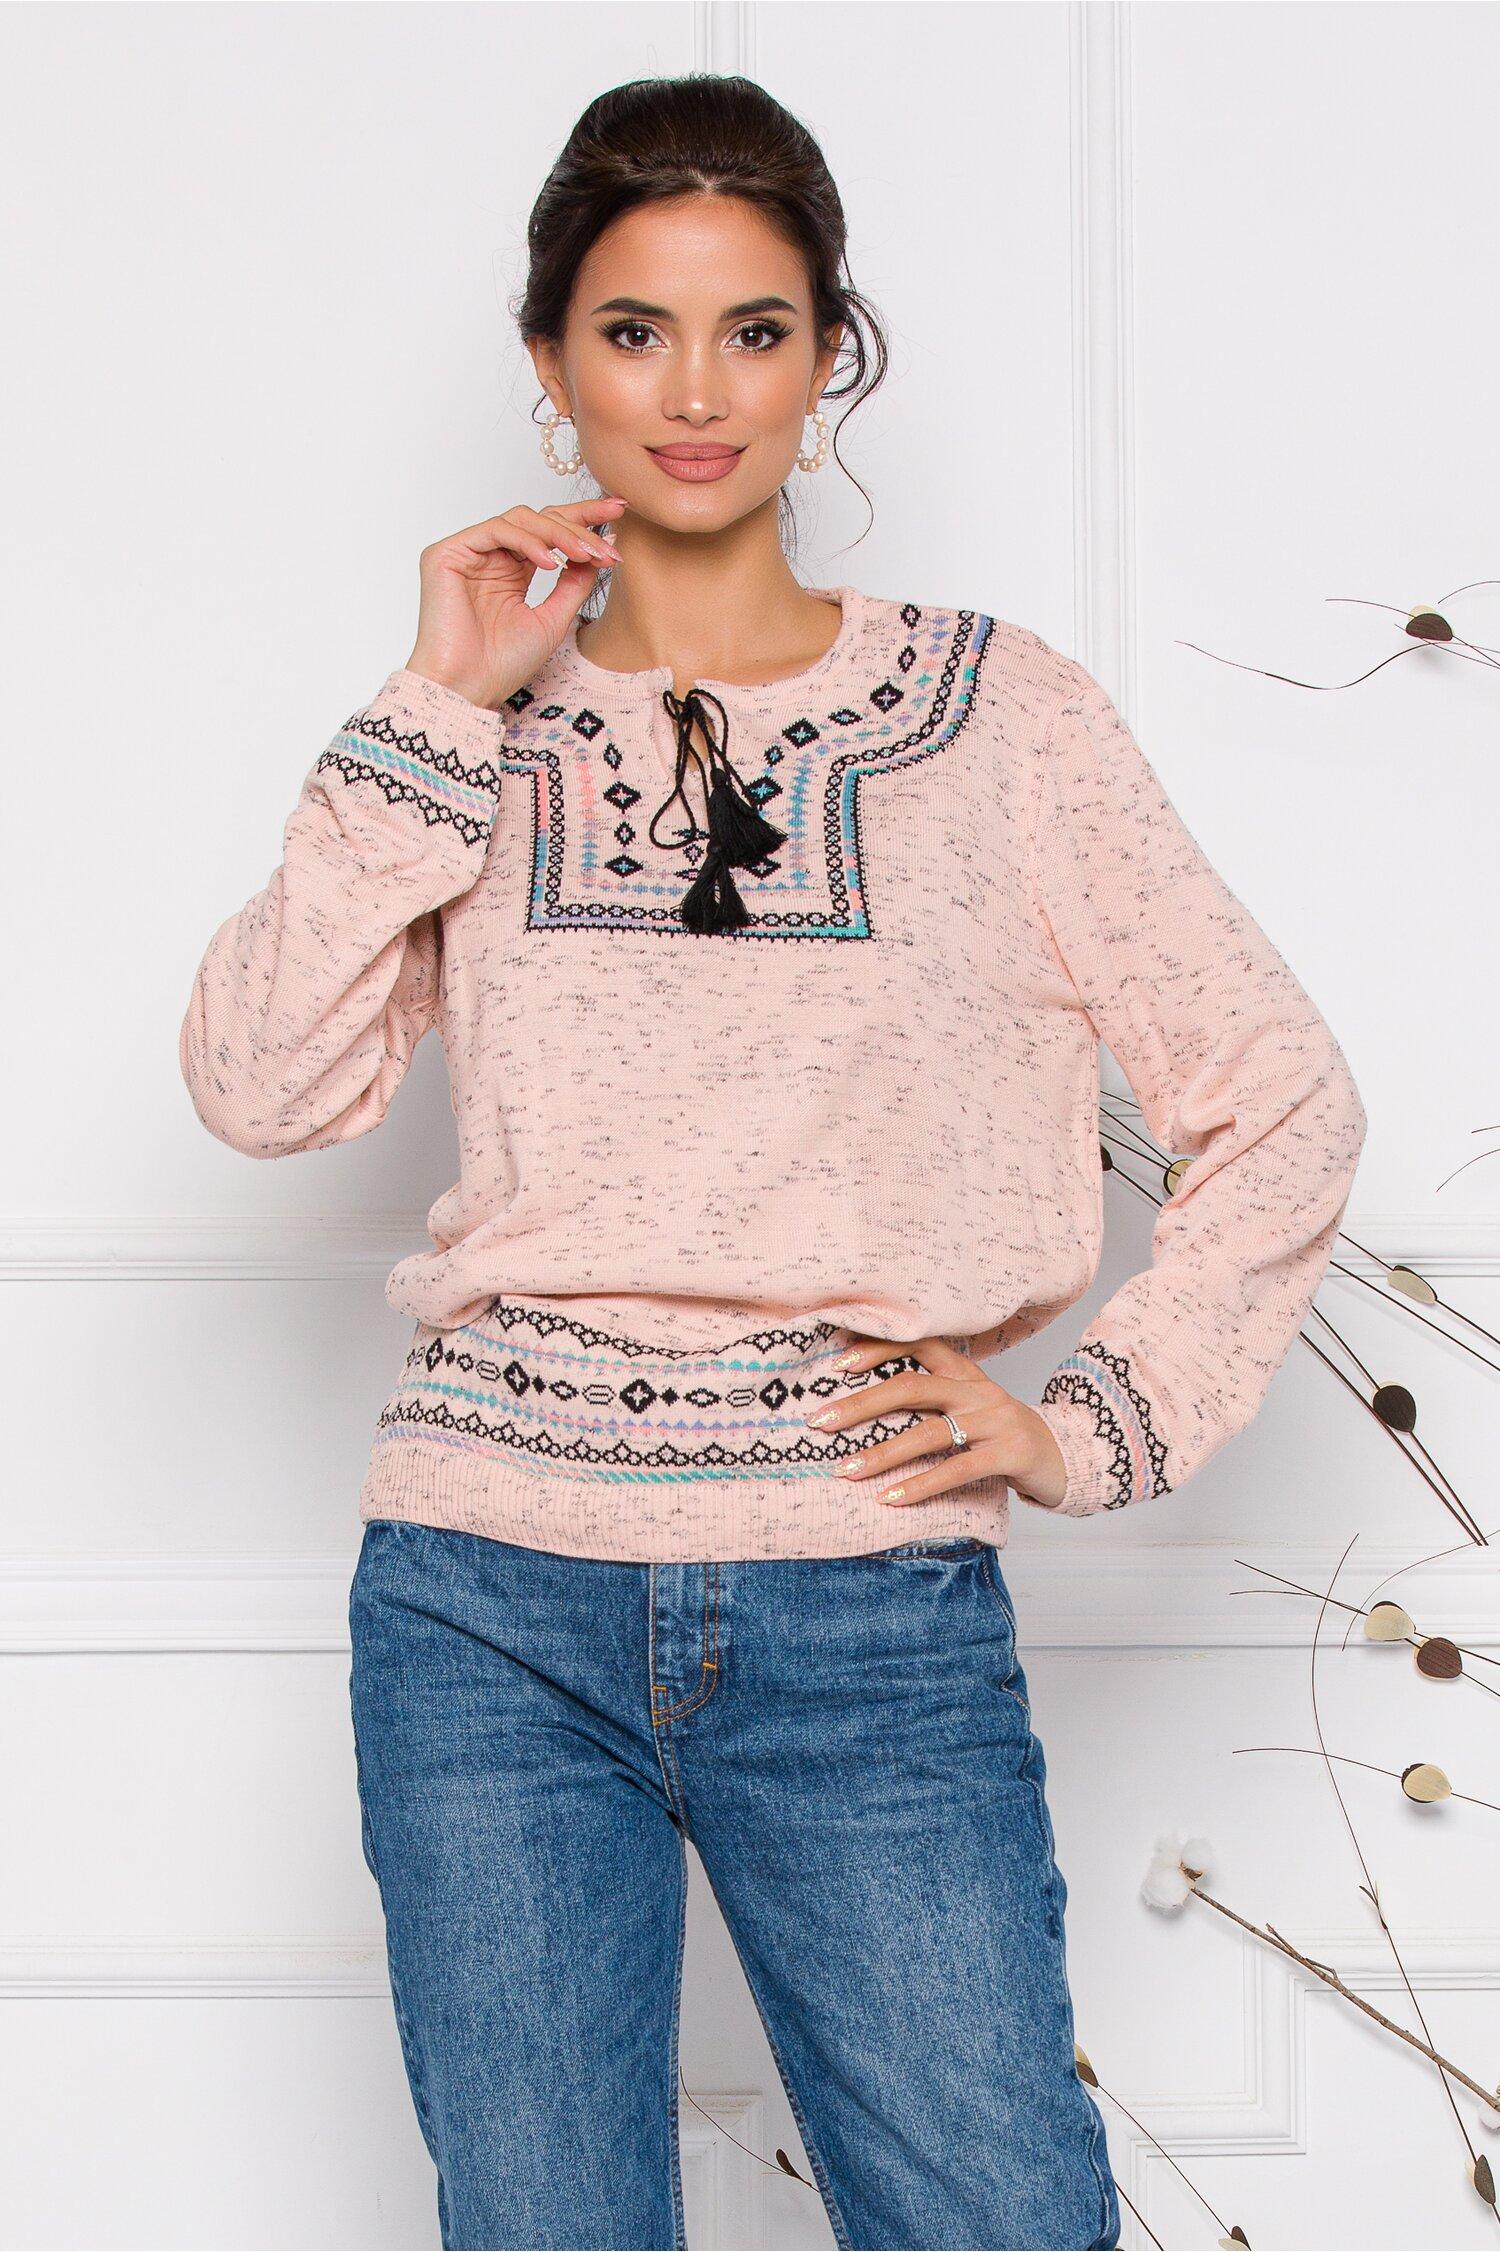 Bluza Mara roz lejera cu imprimeu in stil traditional Idei Cadouri de Craciun Online